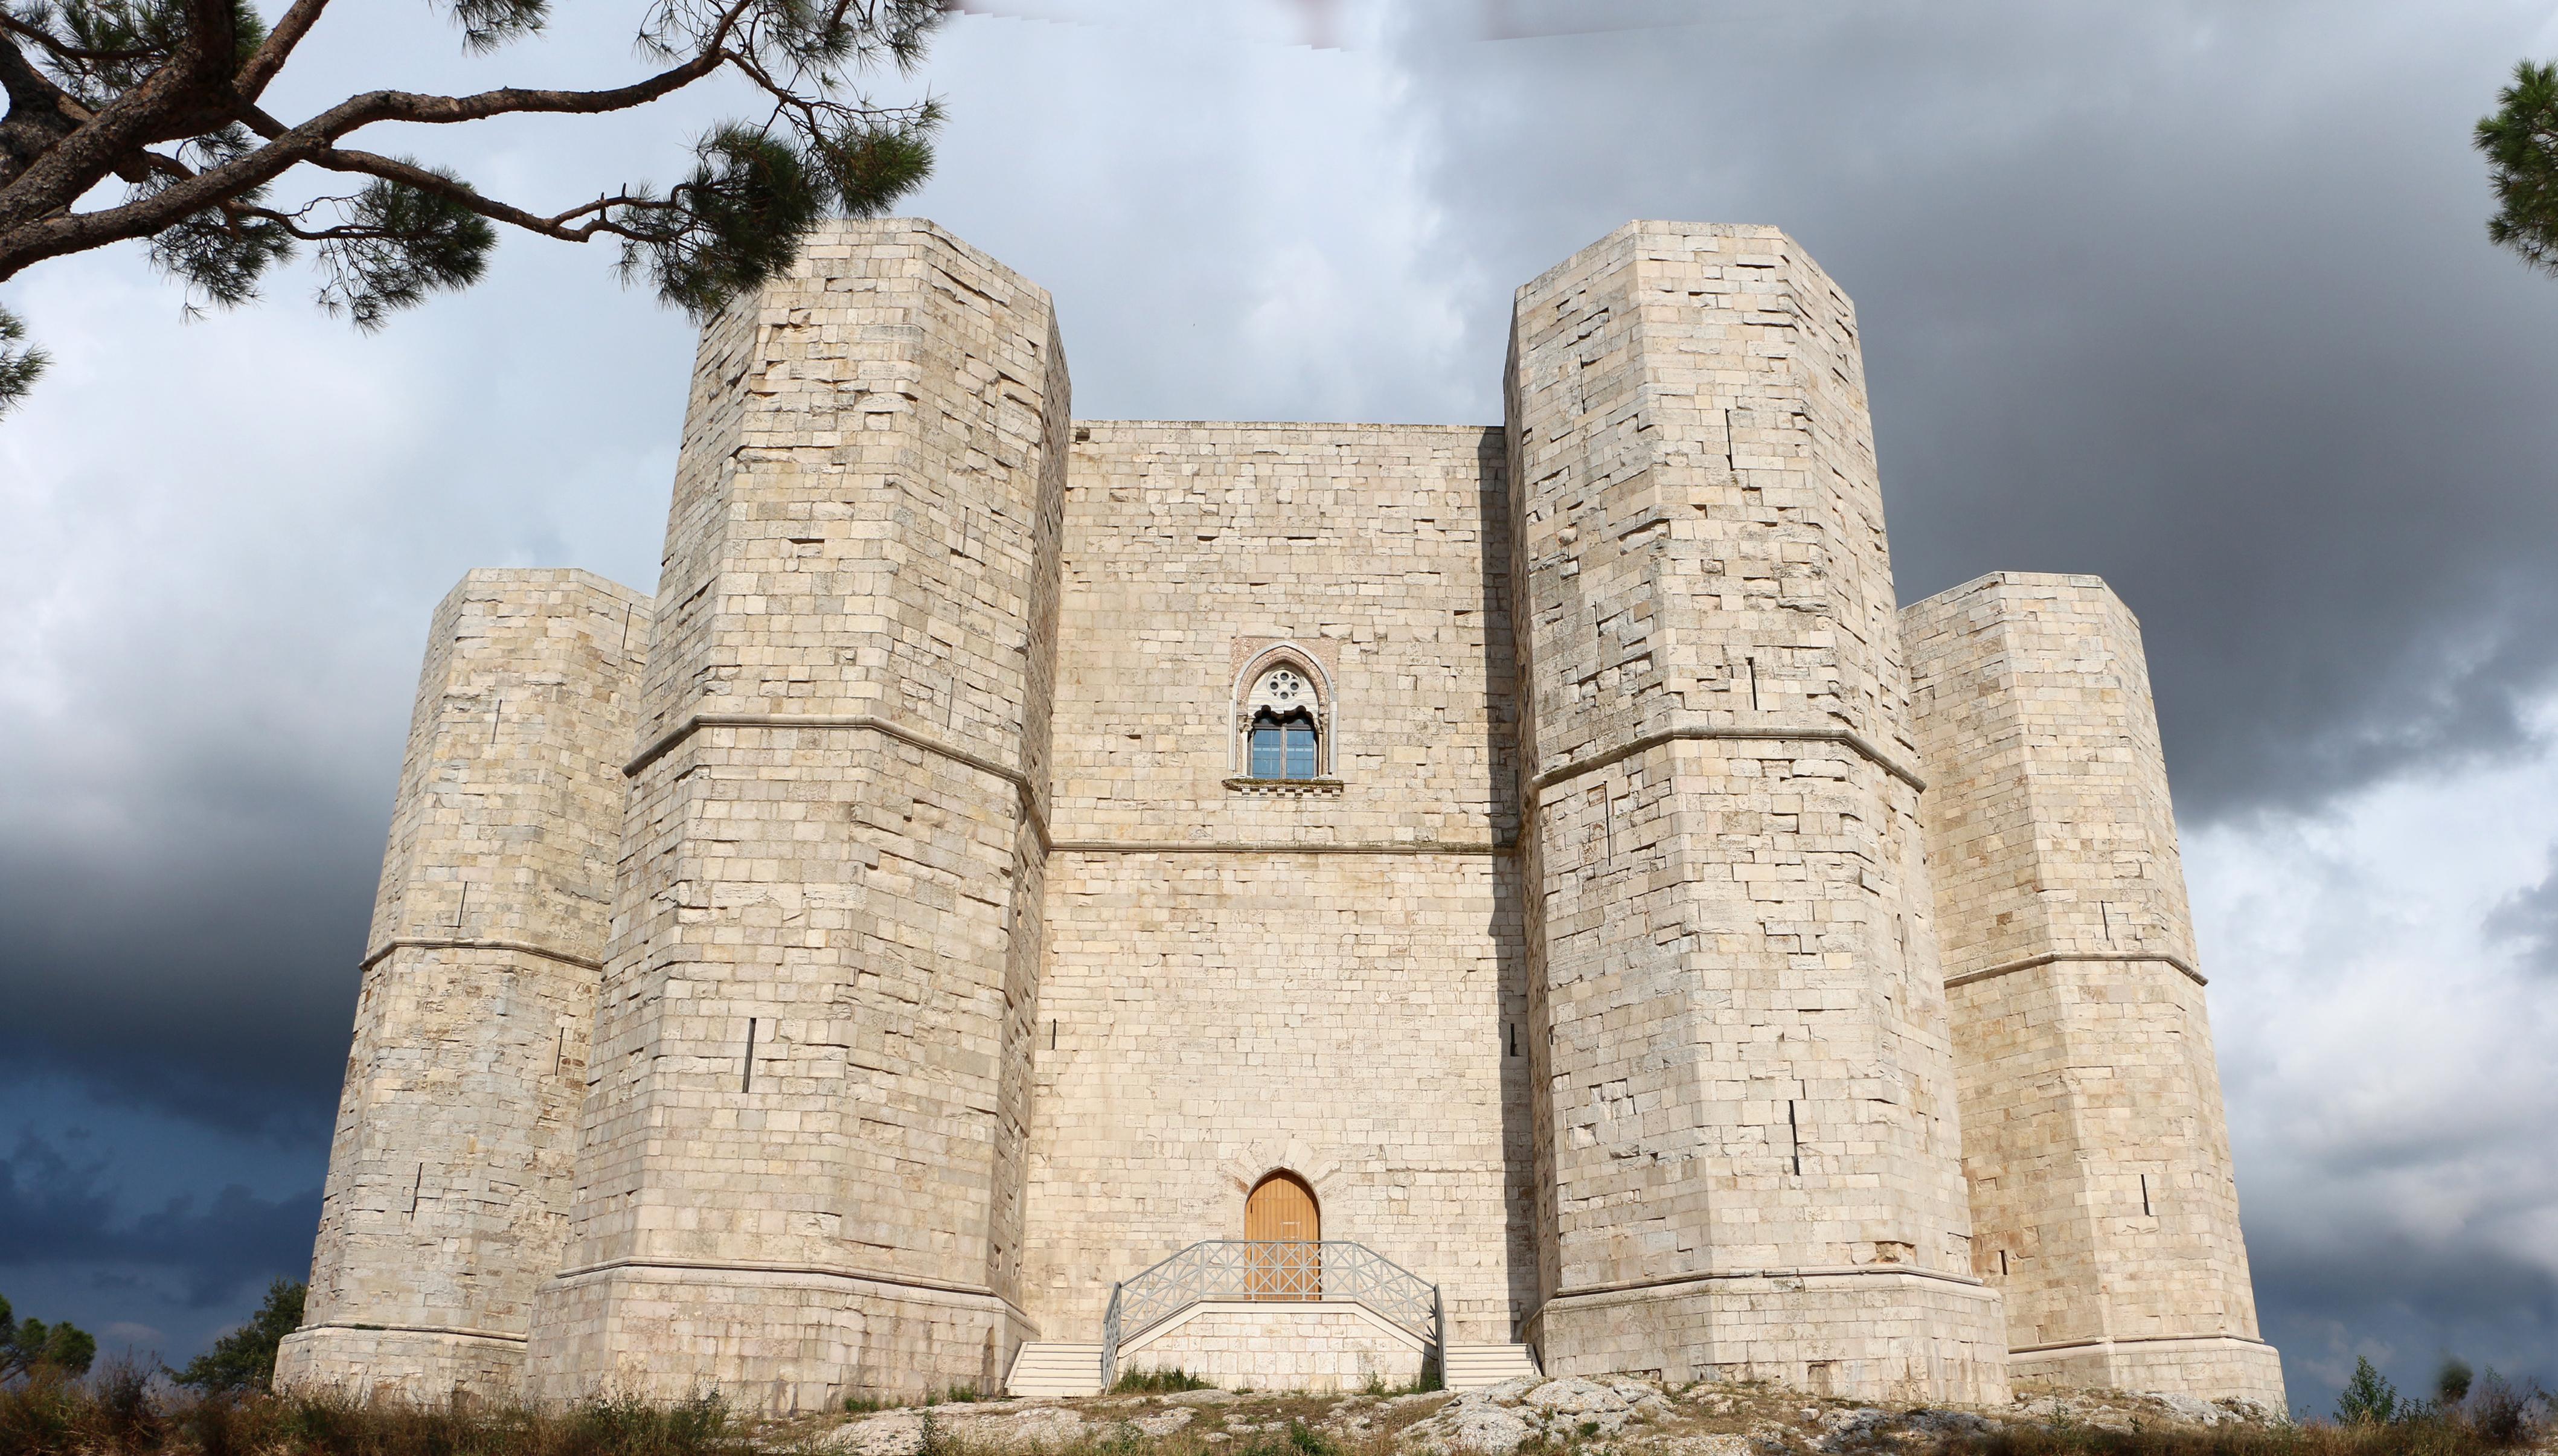 castel del monte - photo #46